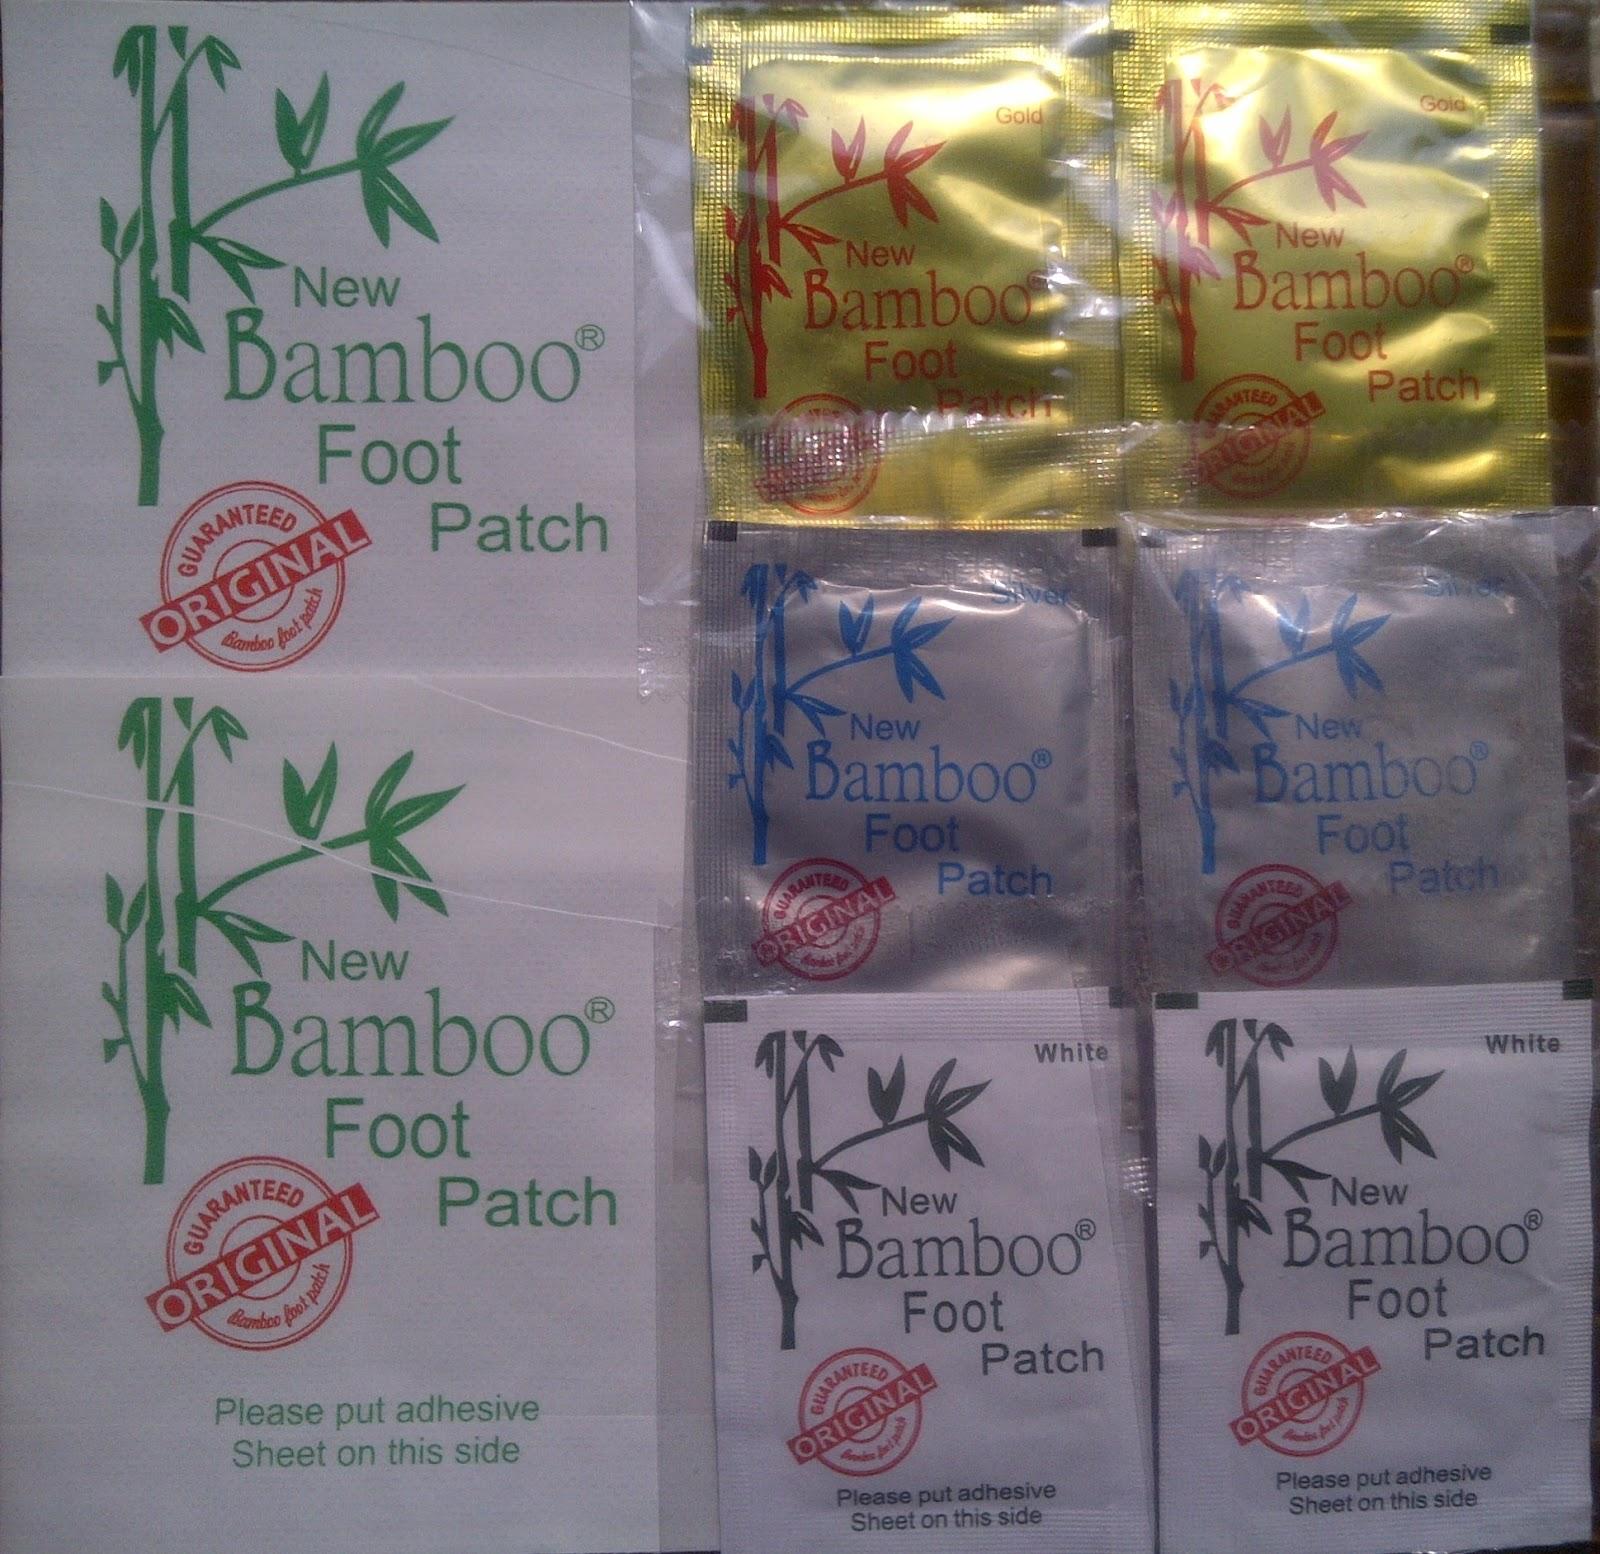 Koyo Kaki New Bamboo Original Stampe The Best Quality Bambo Gold Detox Kesehatan